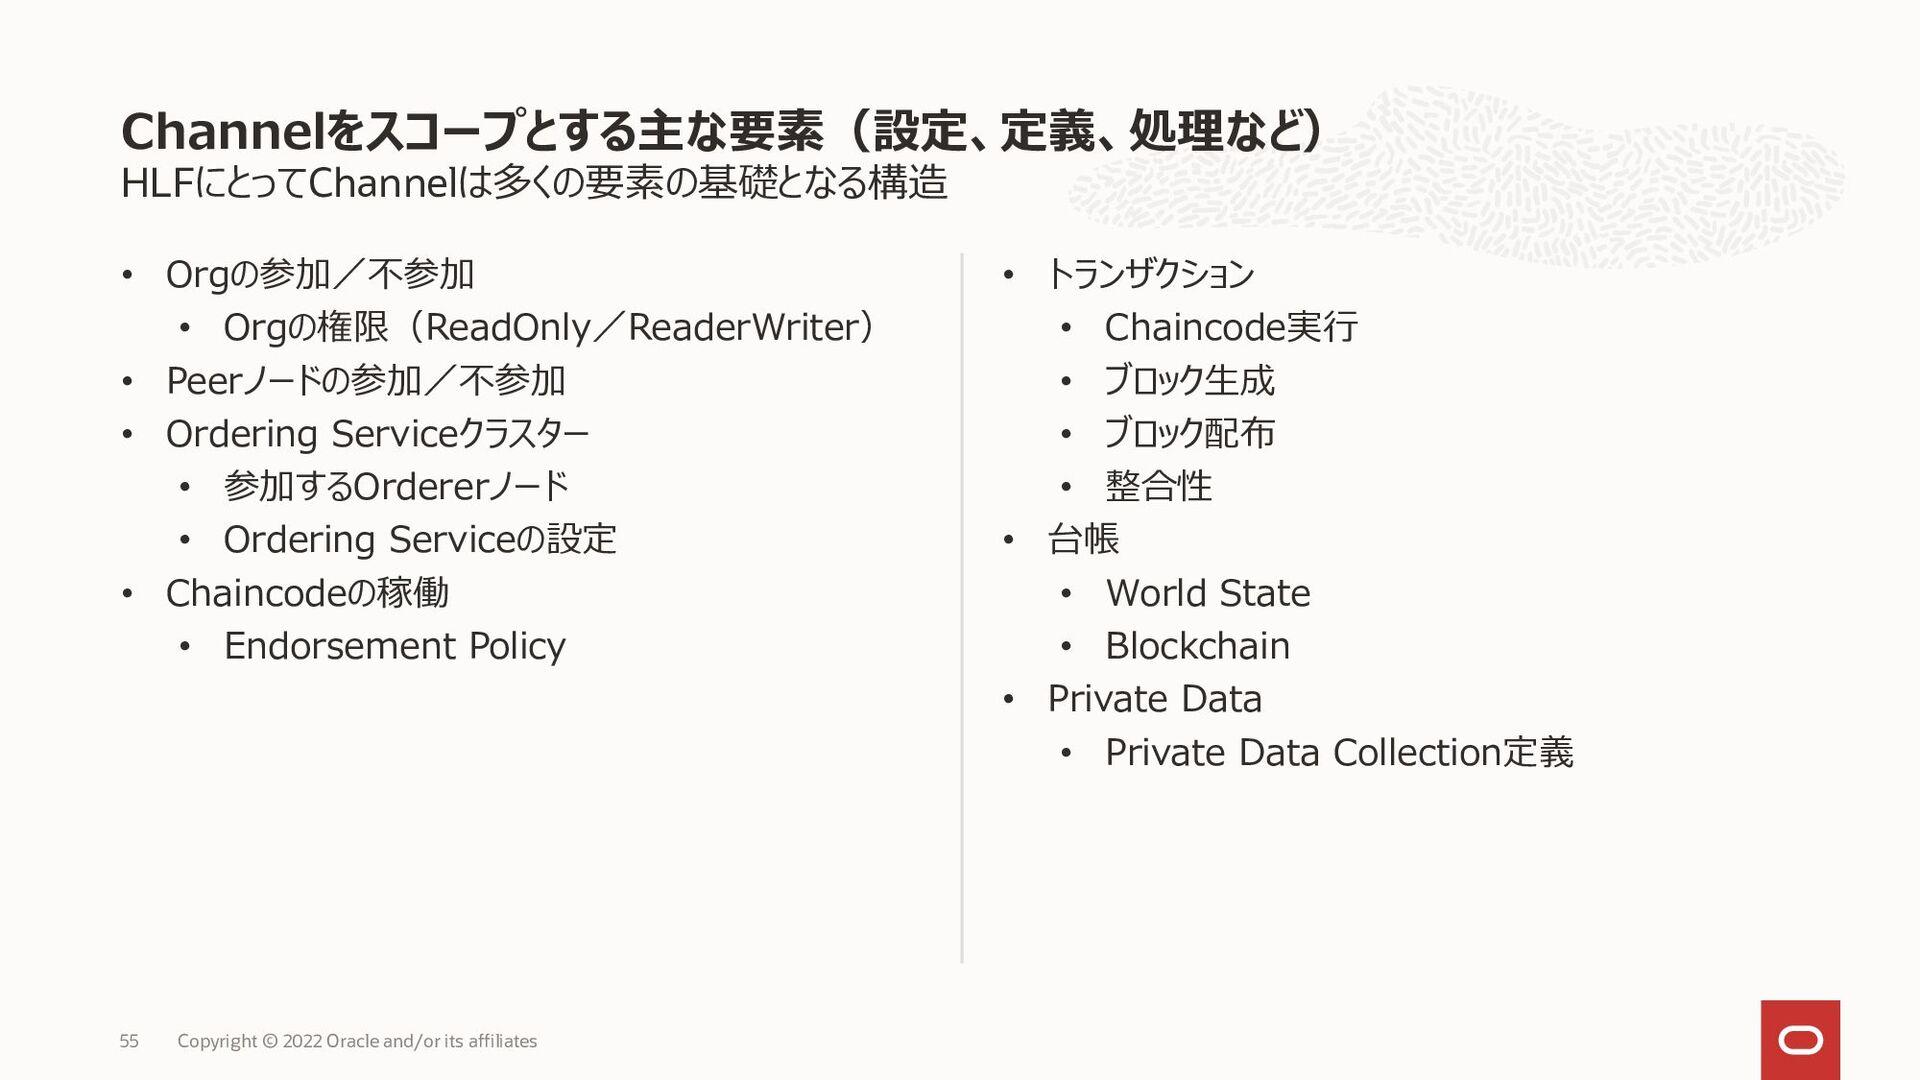 Channel作成、ノード追加、Chaincodeインストール、Chaincode稼働の順序 ...